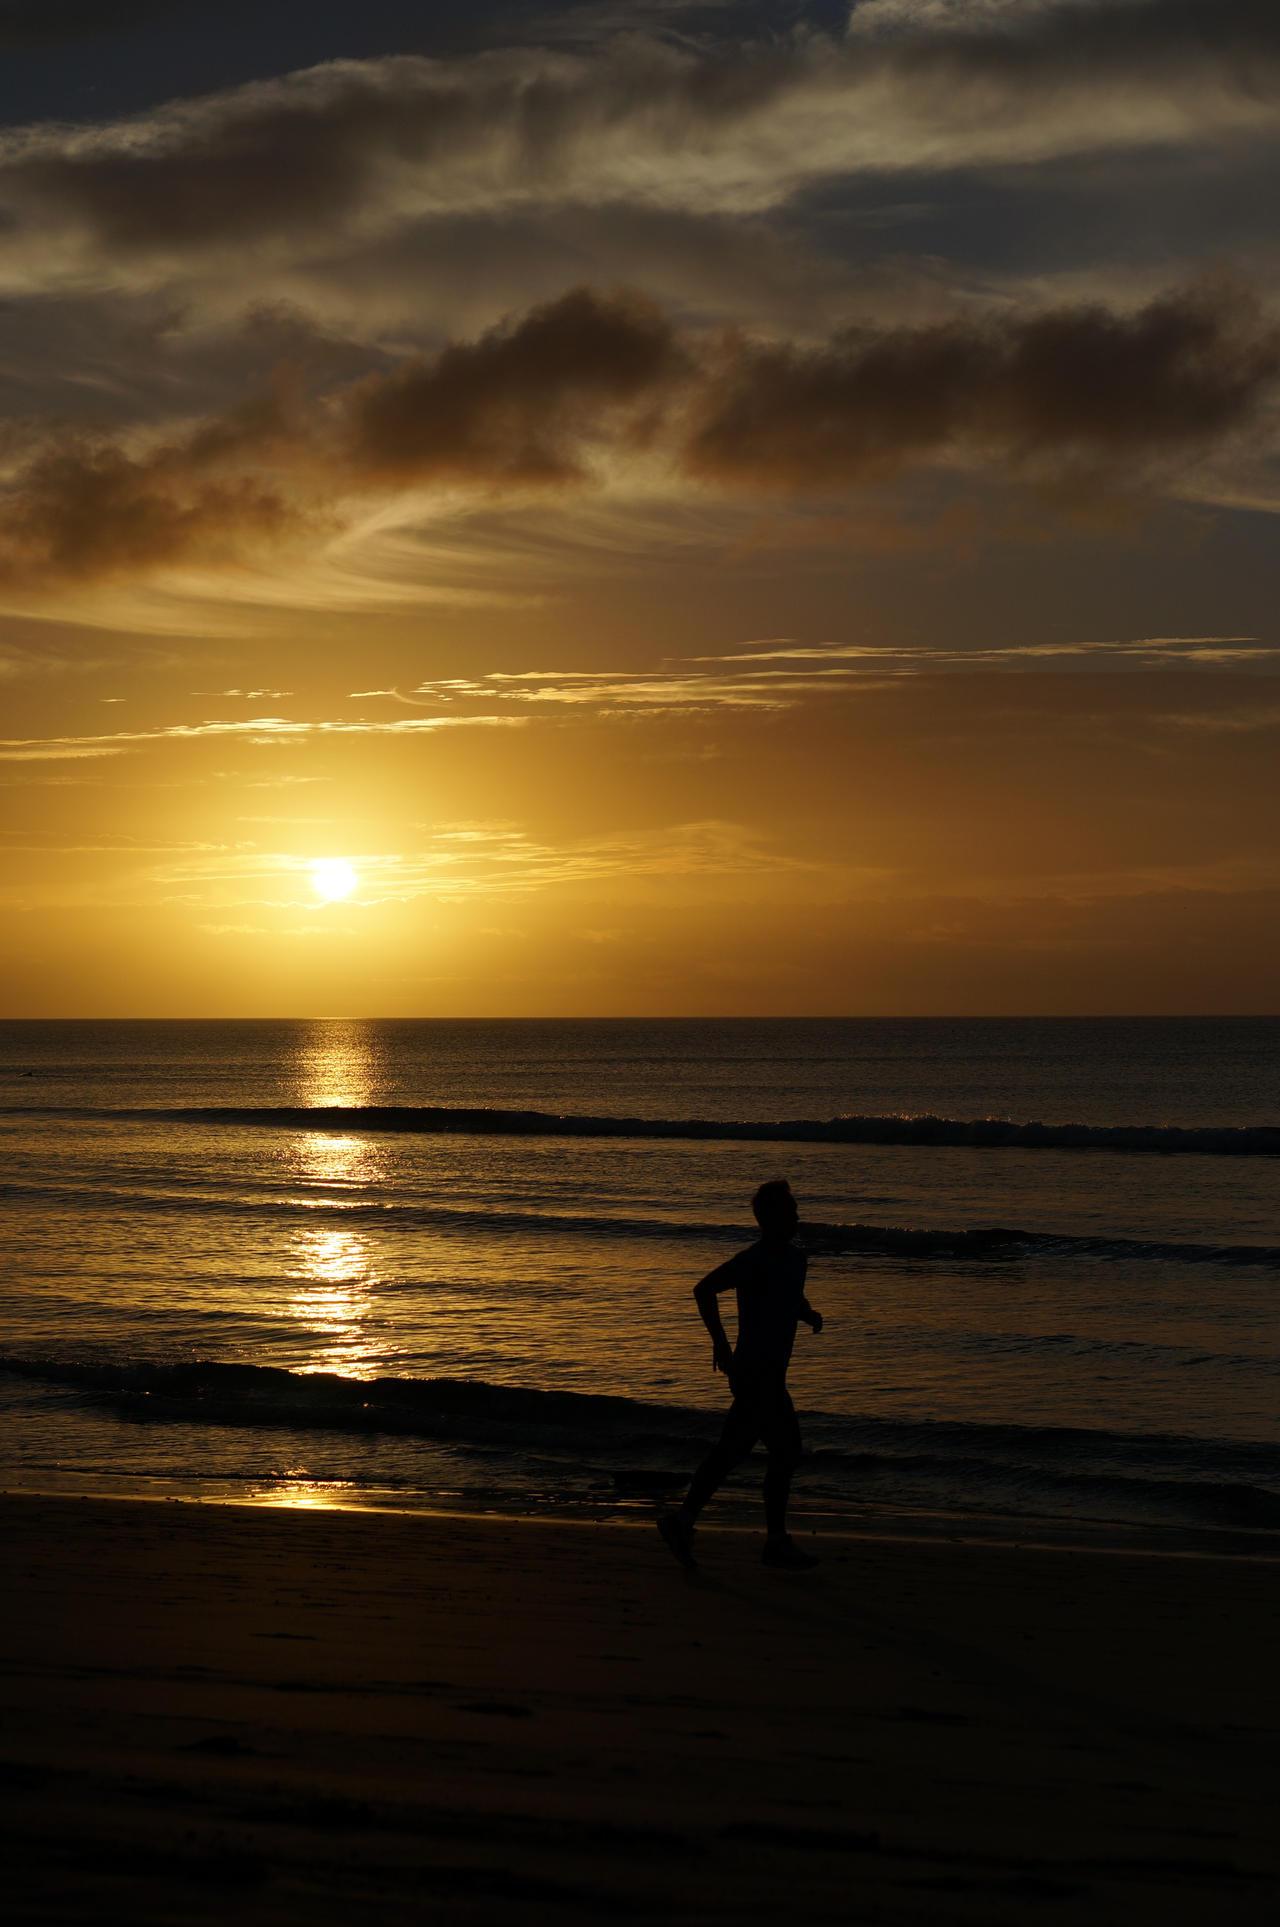 Running in sunrise by darthsabe